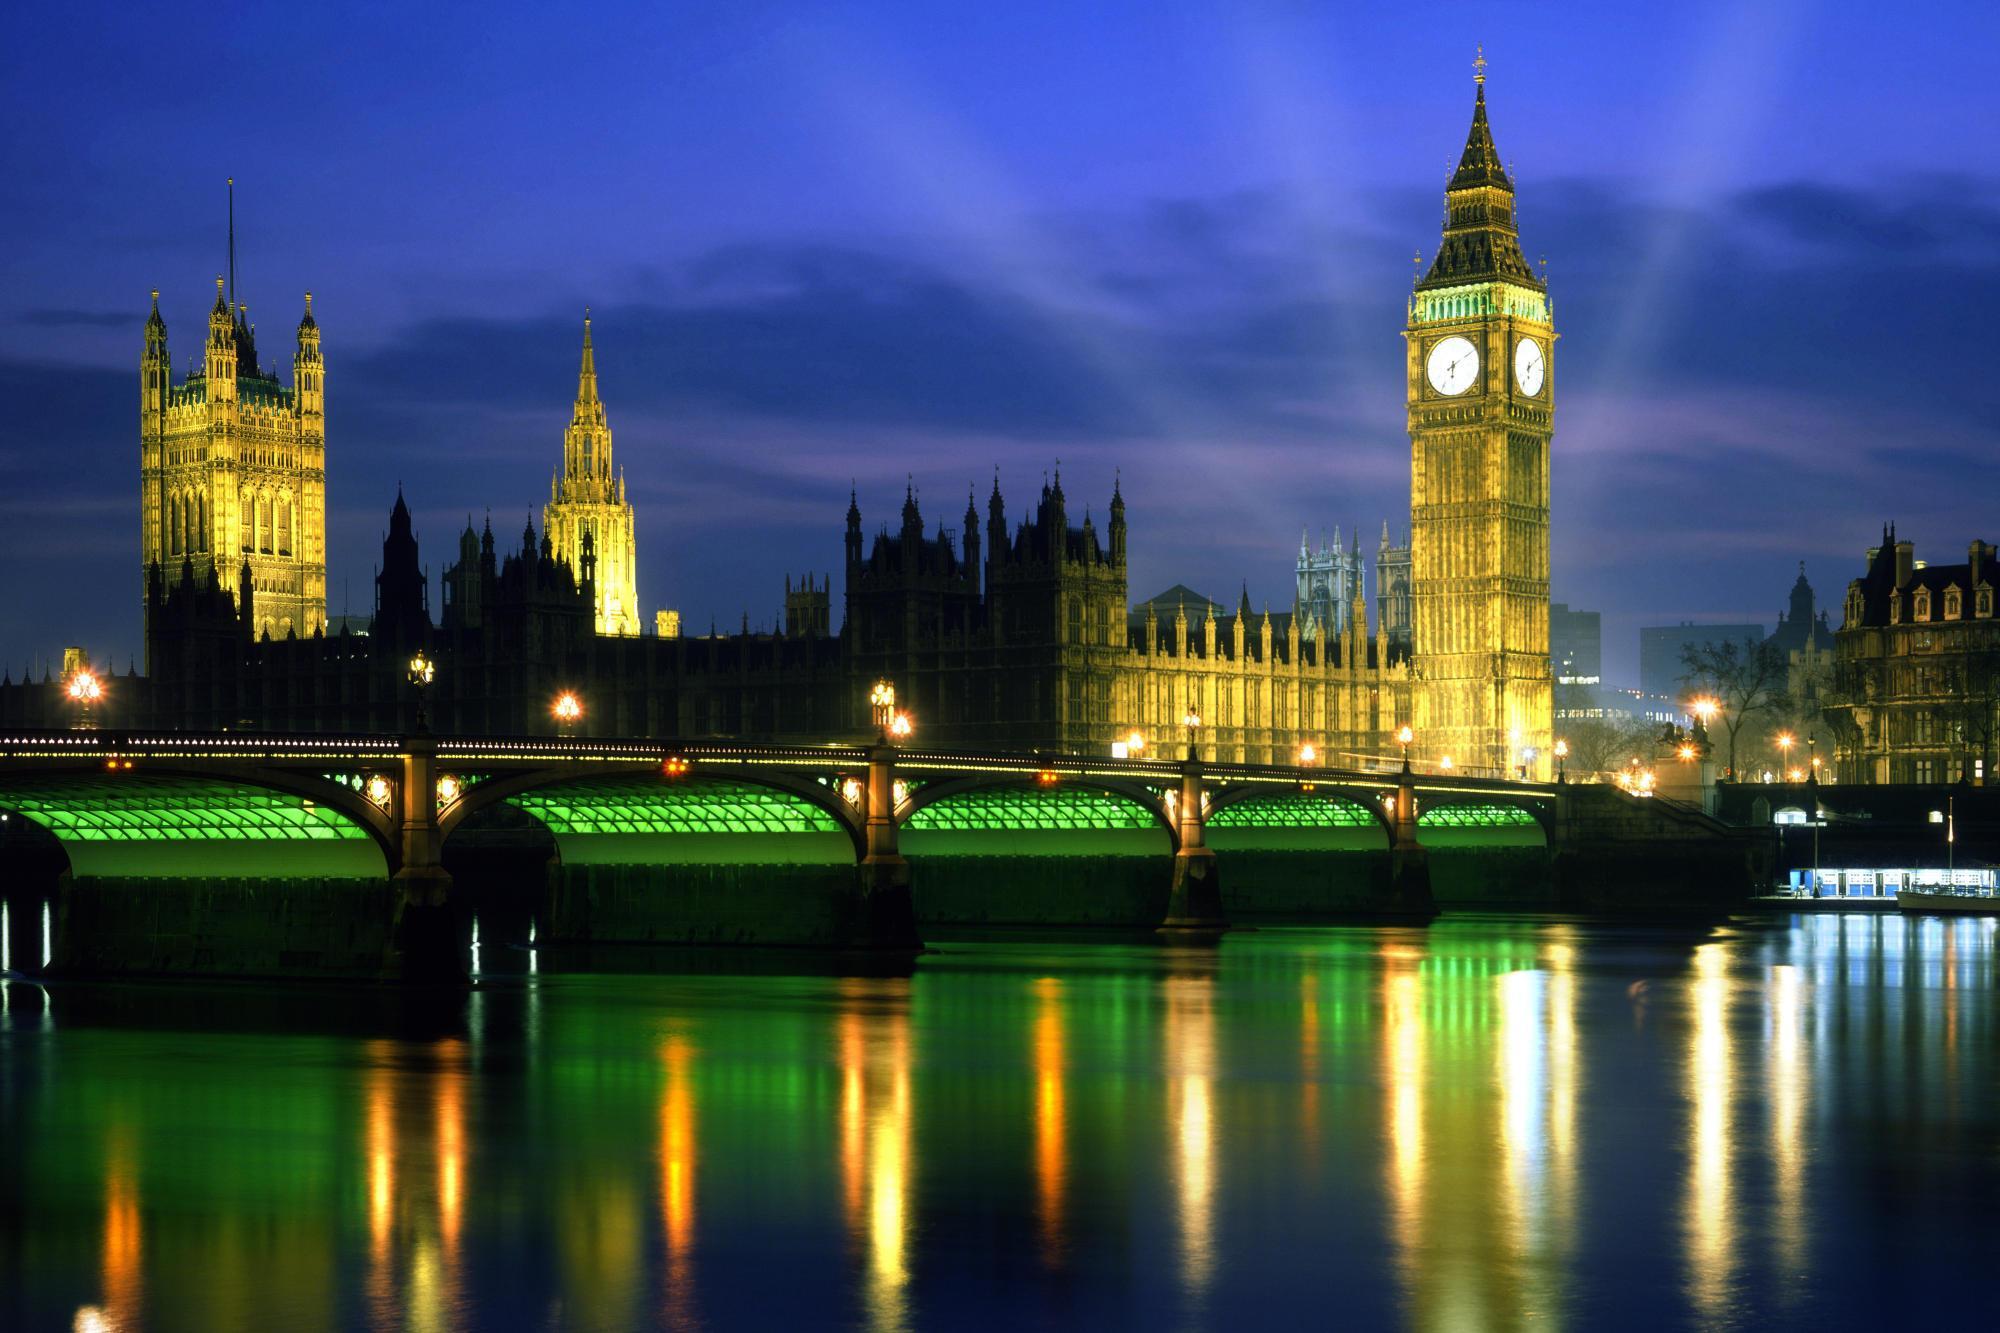 London In England 30 Cool Hd Wallpaper   Hivewallpapercom 2000x1333